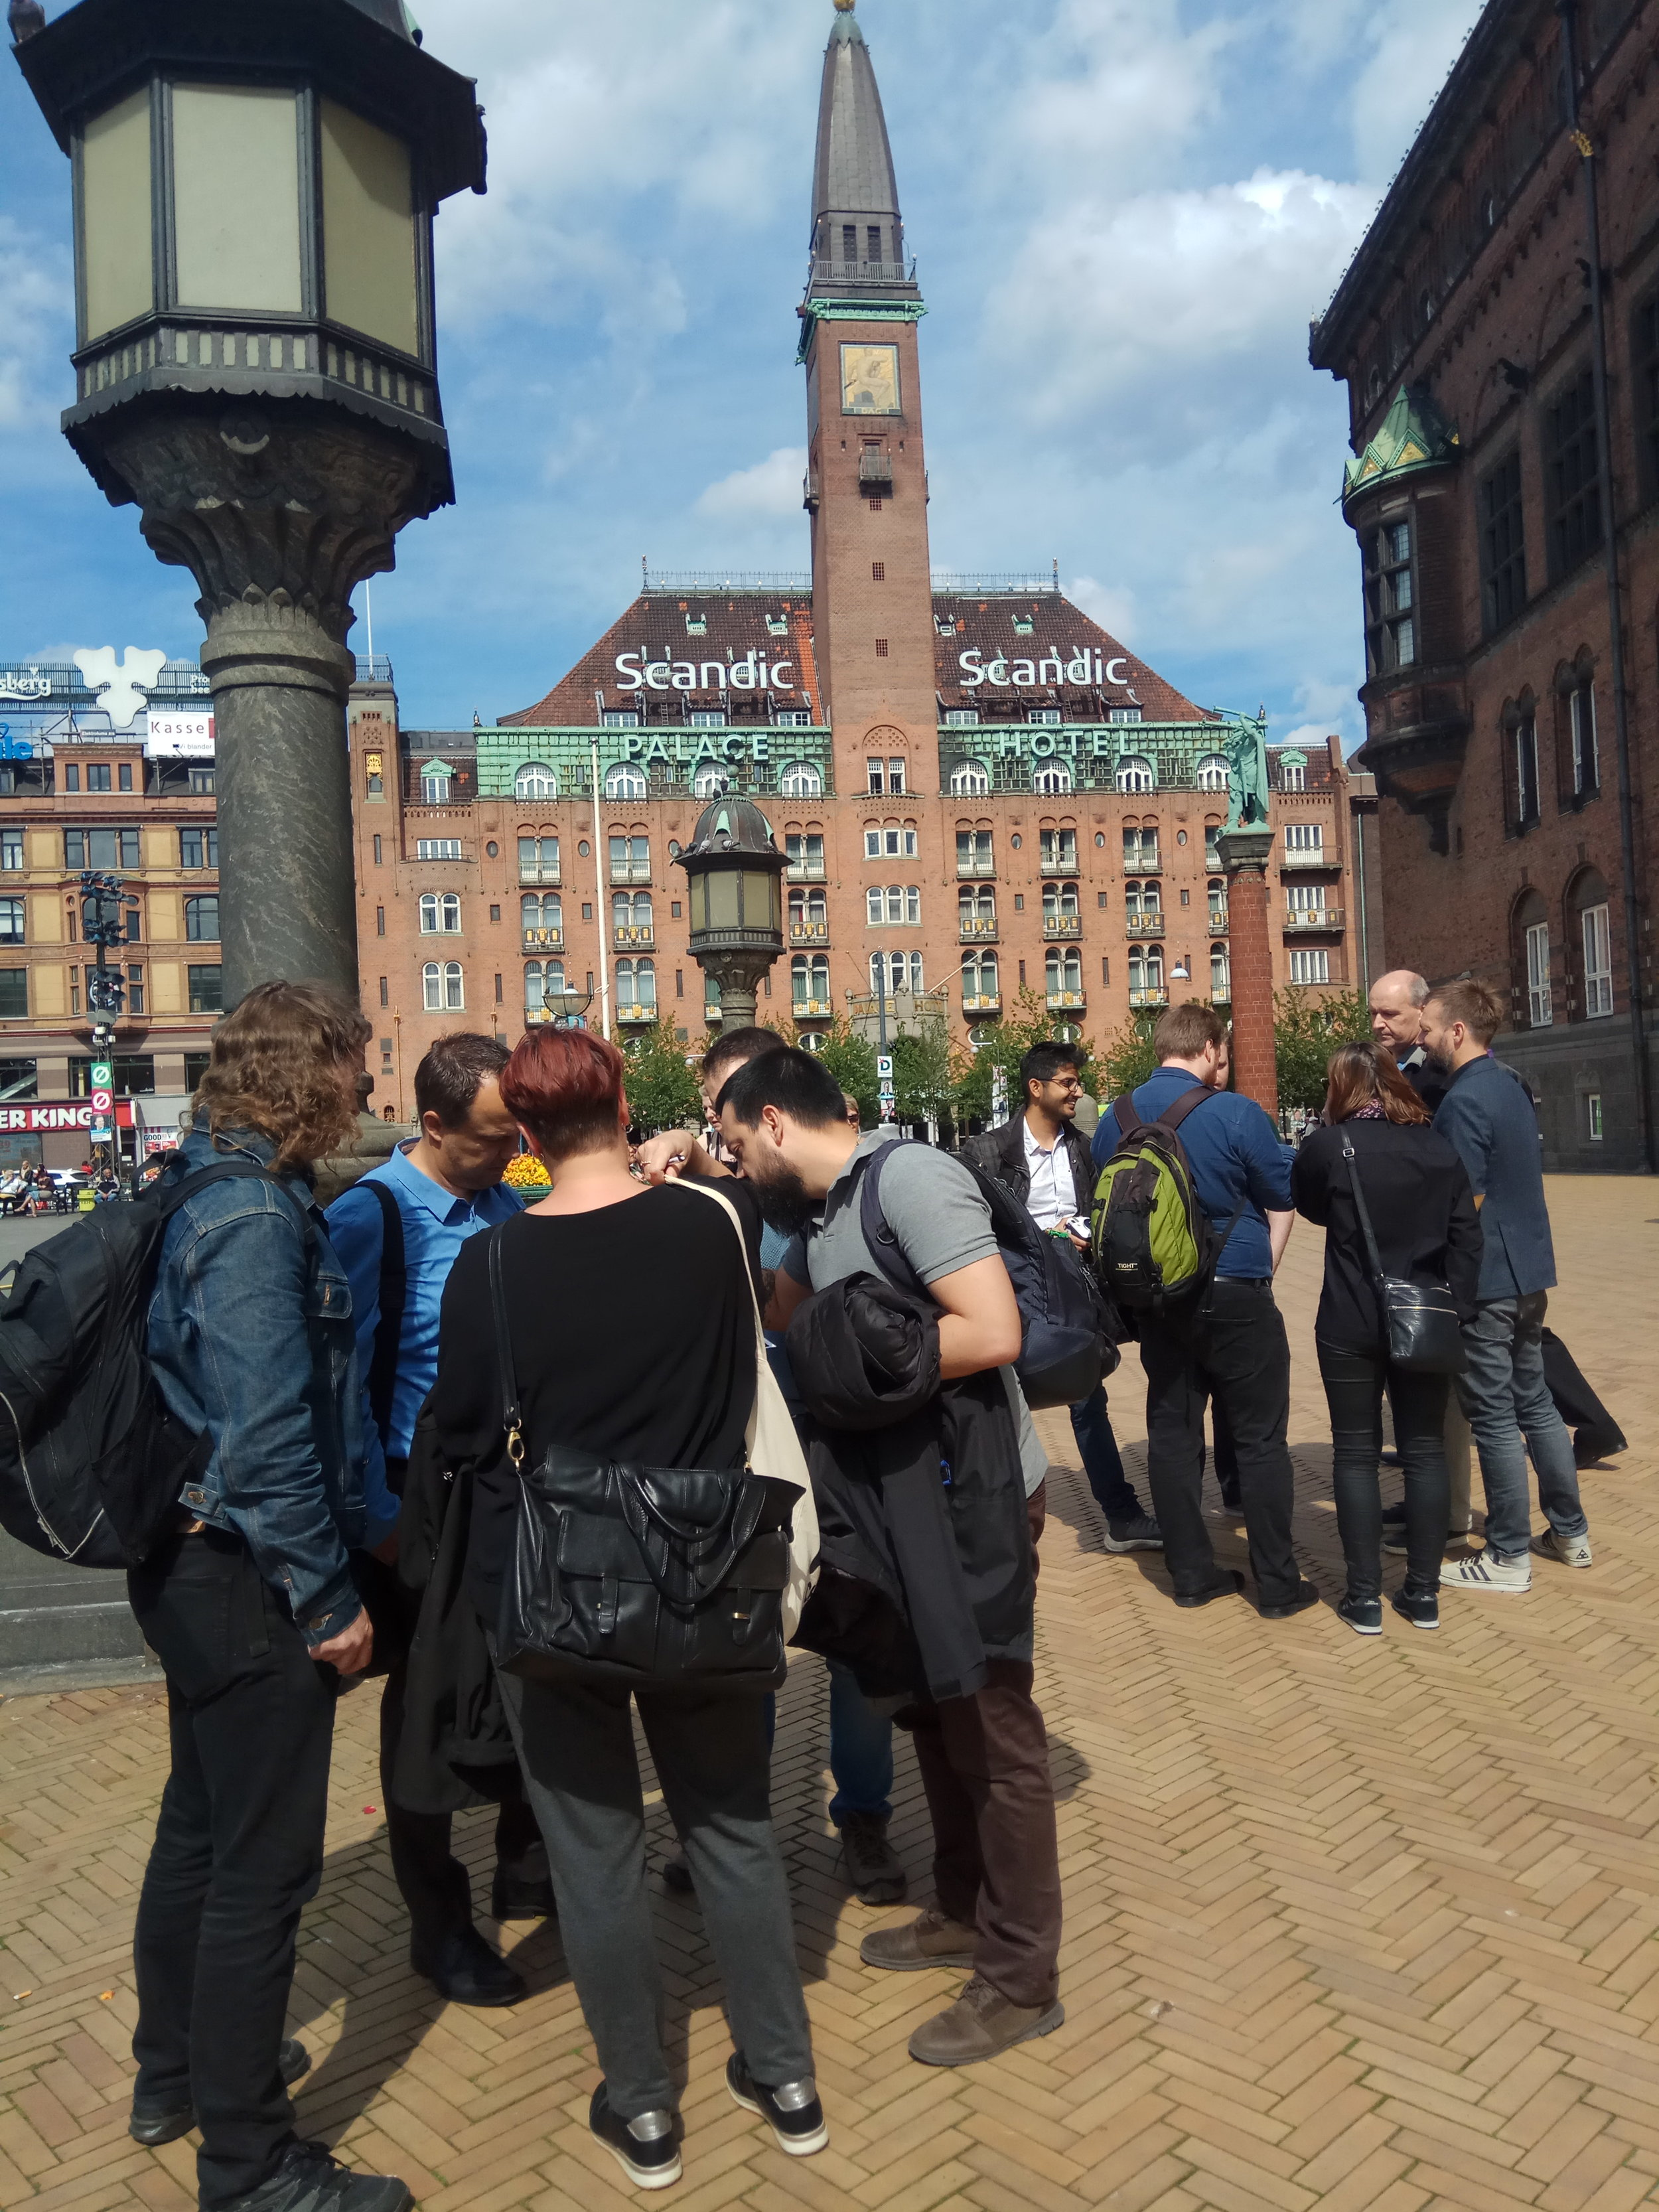 IMG_20190523_145646 - 100 Point Challenge Copenhagen.jpg